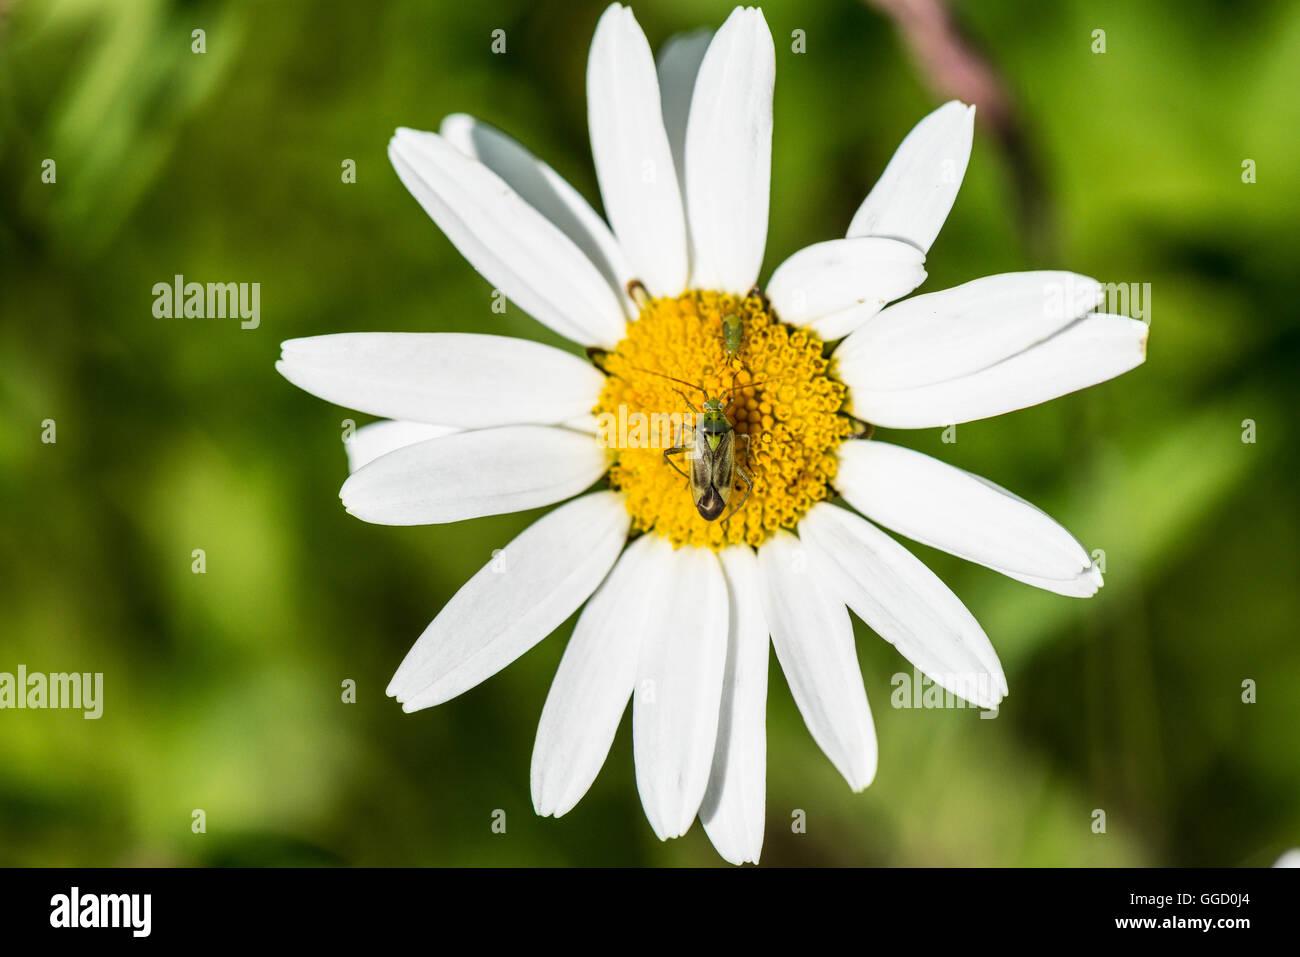 Common green capsid (Lygocoris pabulinus Miridae) on an ox-eyed daisy (Leucanthemum vulgare) - Stock Image